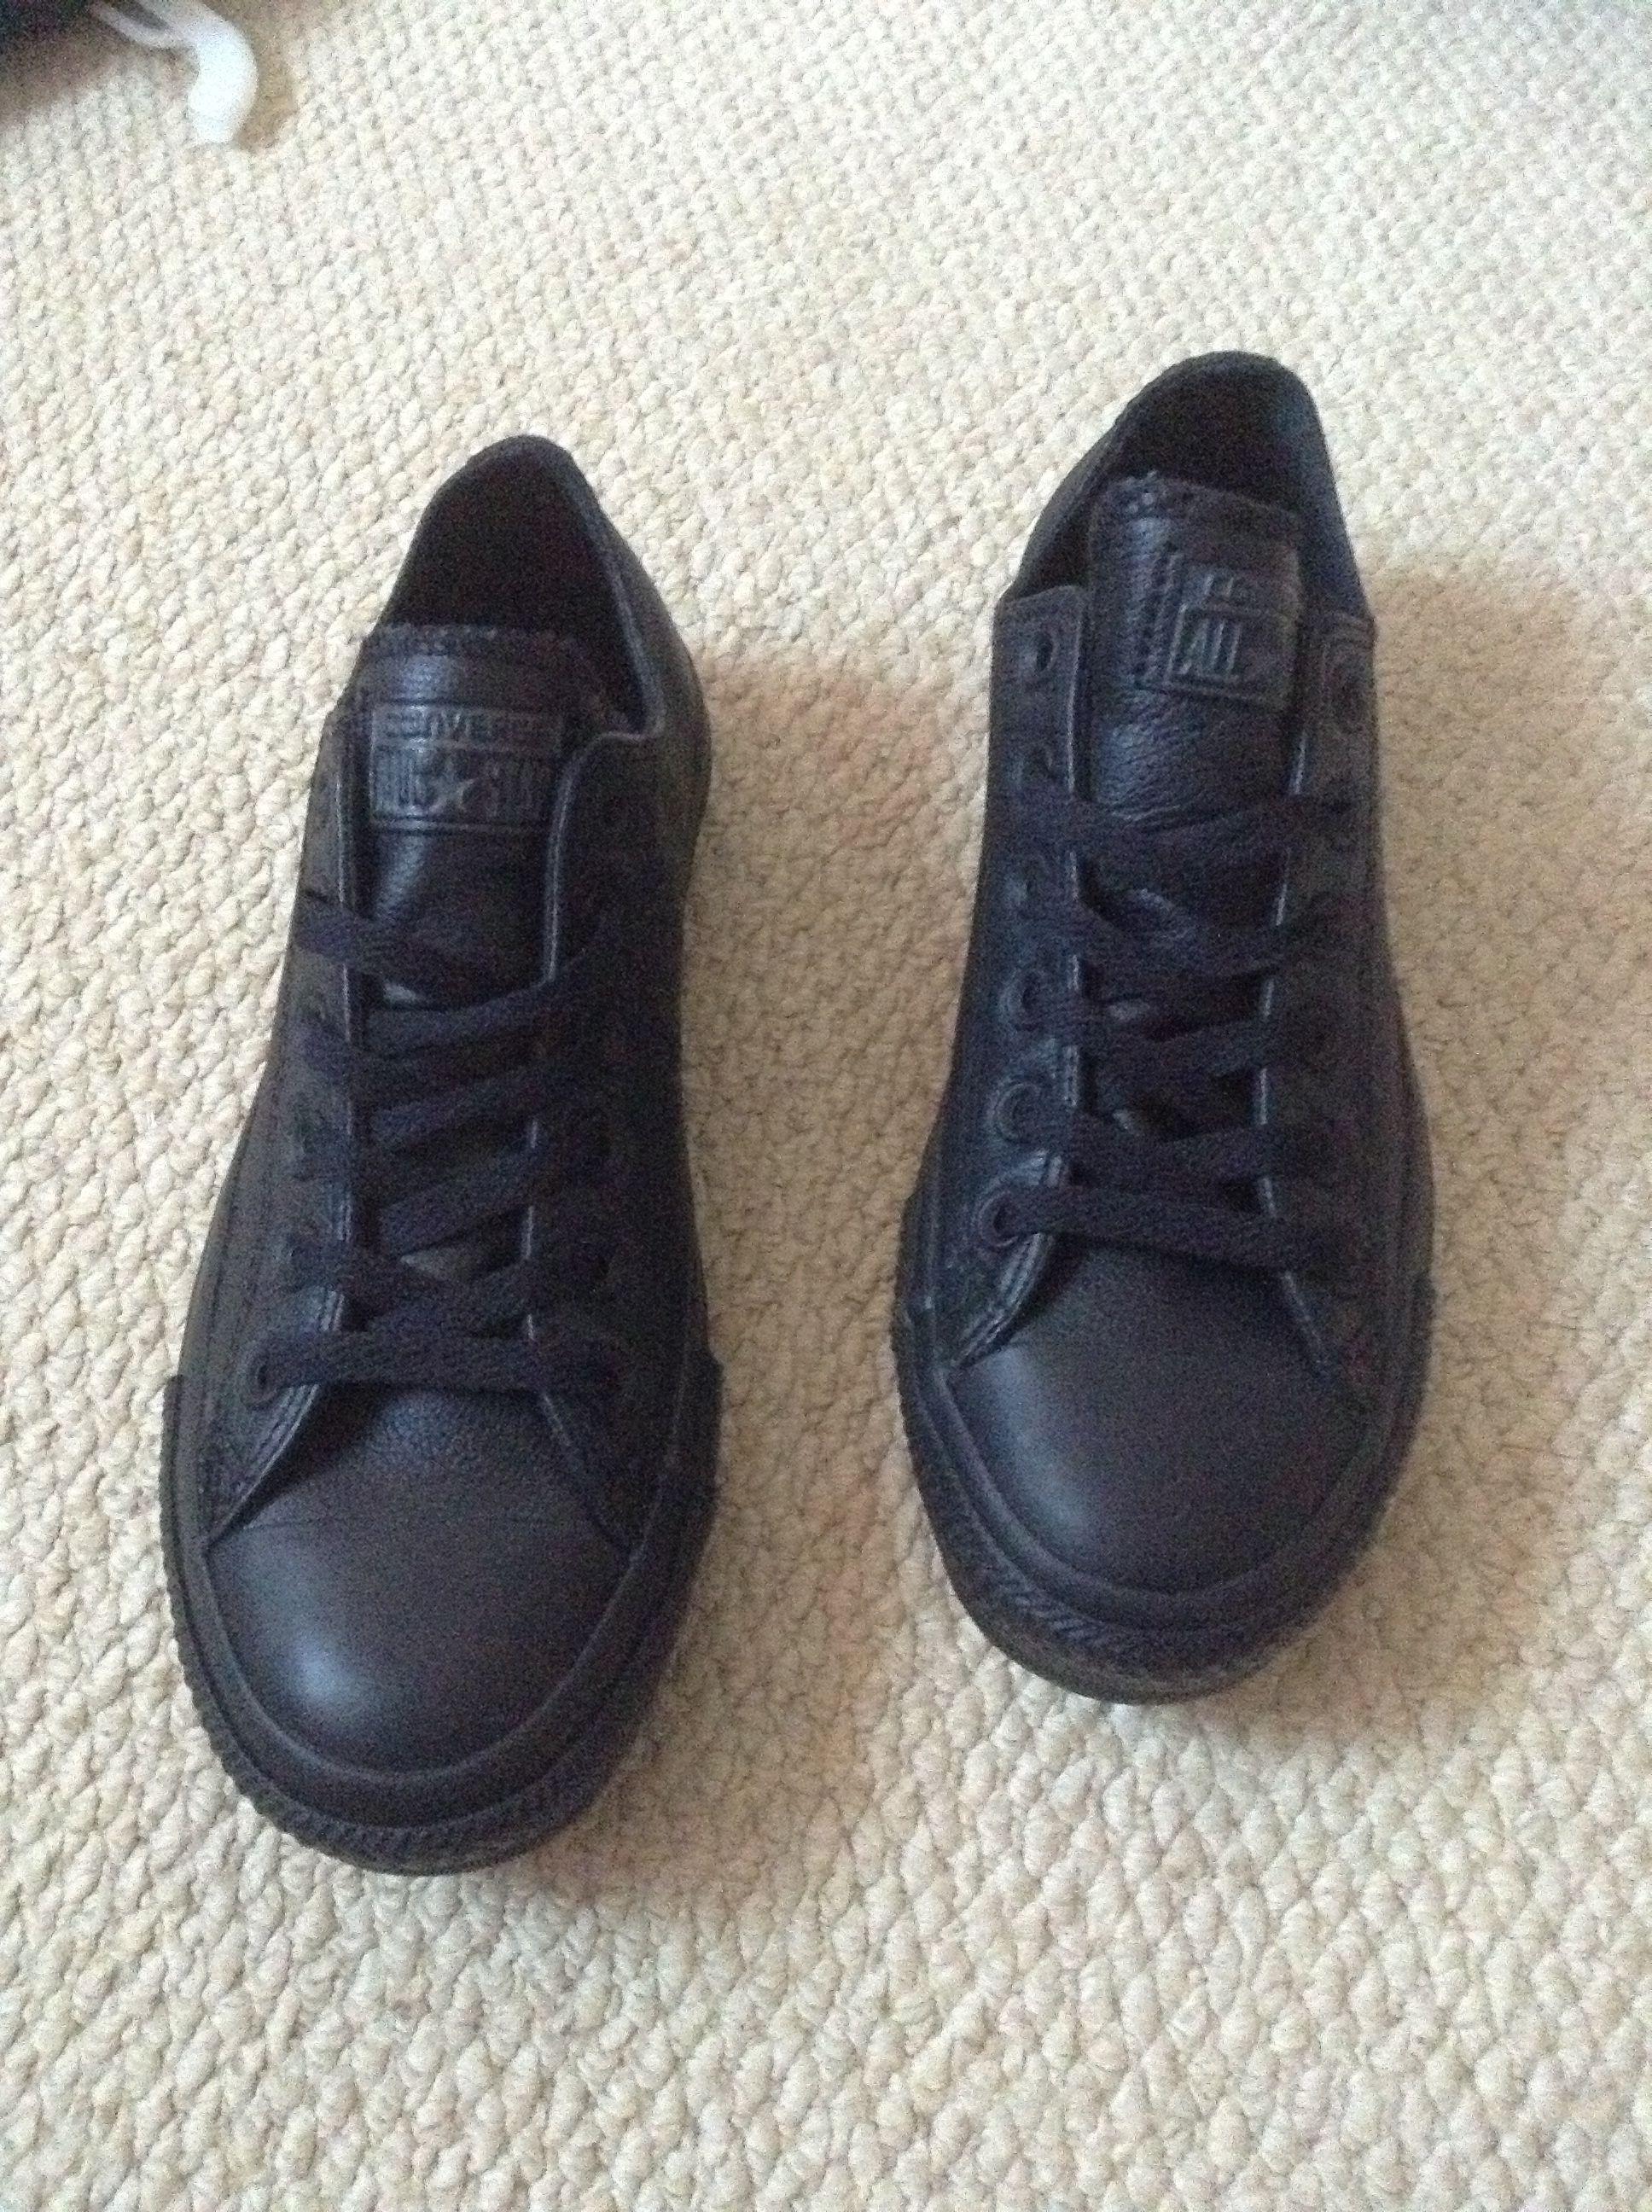 black converse school shoes \u003e Clearance